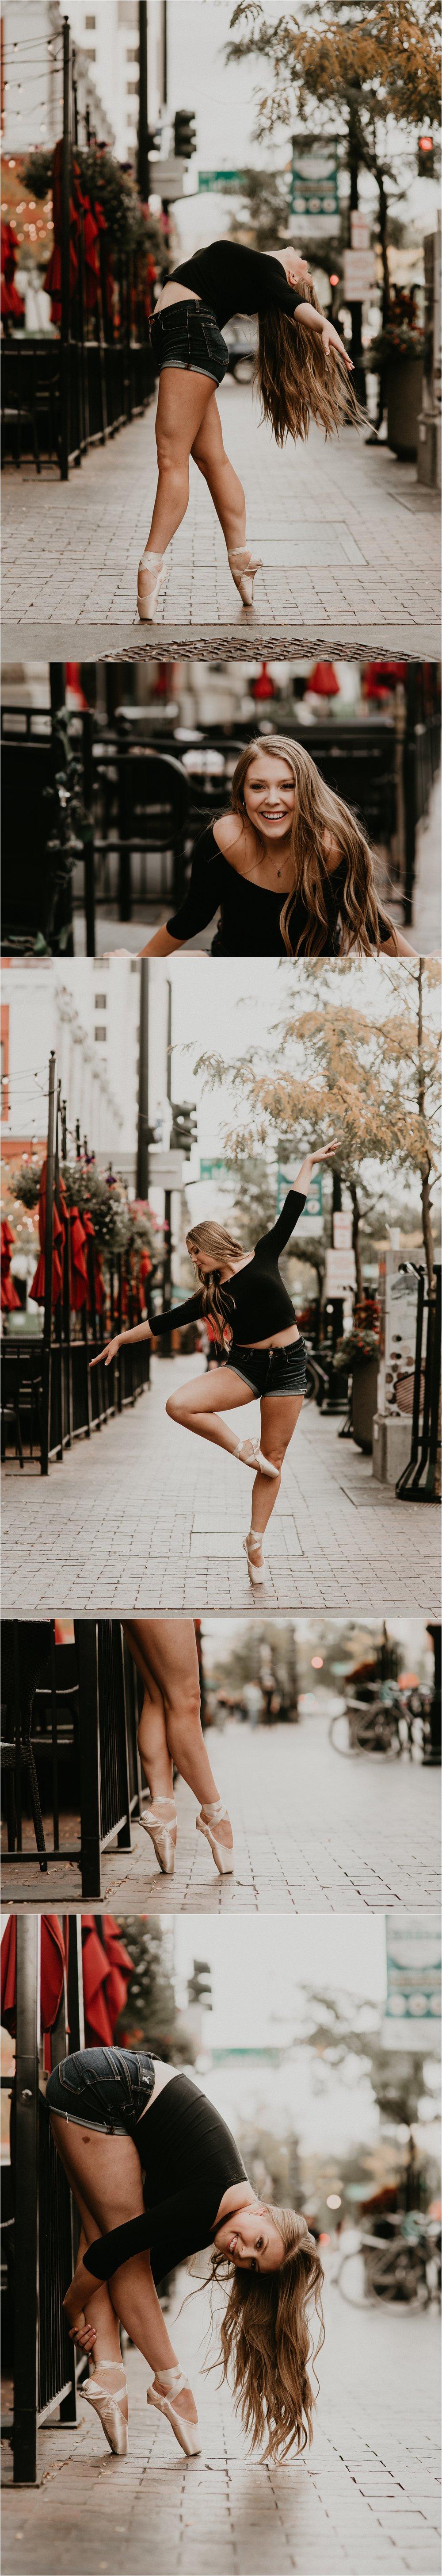 Boise Senior Photographer Makayla Madden Photography Senior Girl Capital High School Kailee Roberts Urban Dancing Senior Pictures Ballet Point Dance Senior Photos